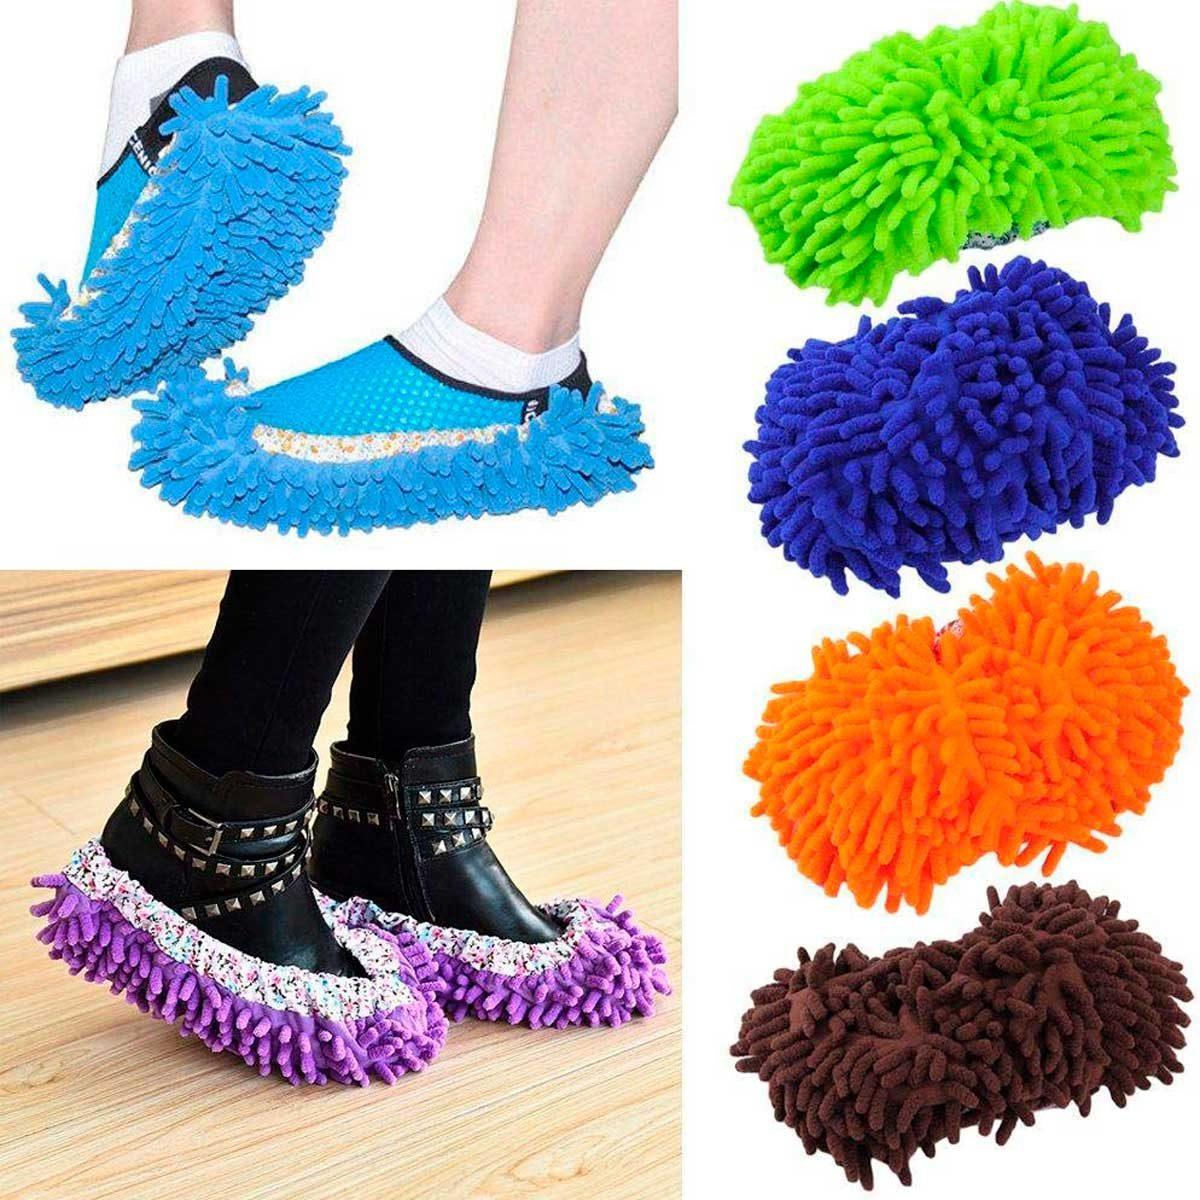 slipper dusters